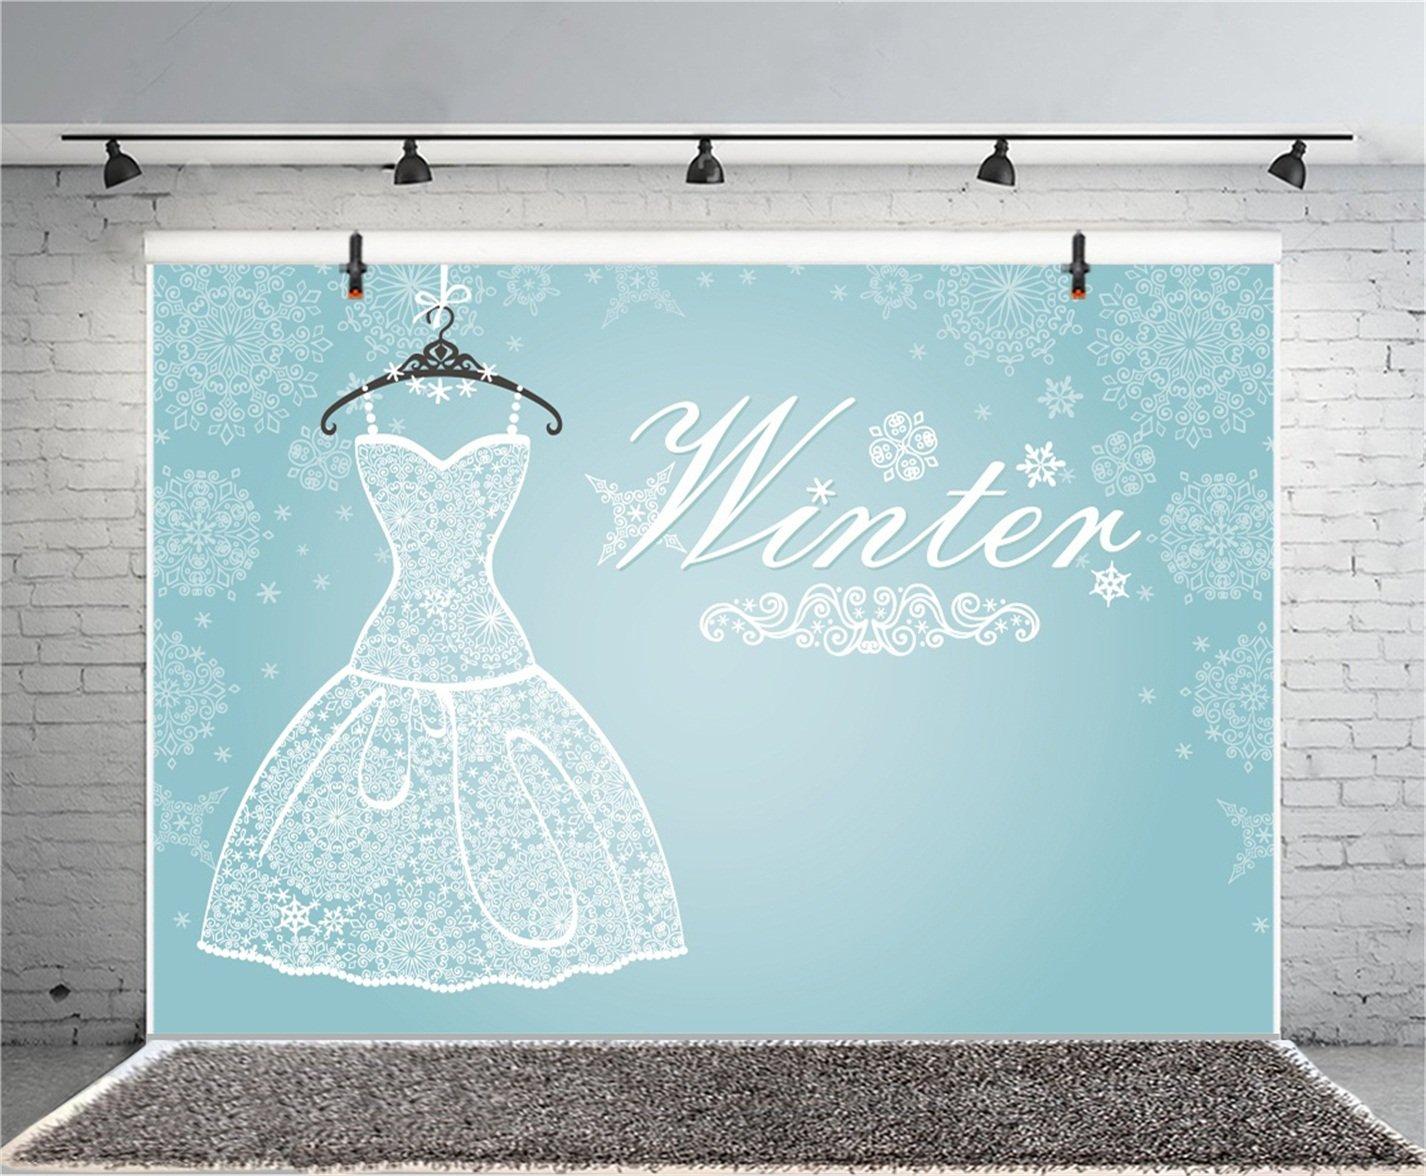 Amazon Csfoto 5x3ft Background For Winter Wedding Party